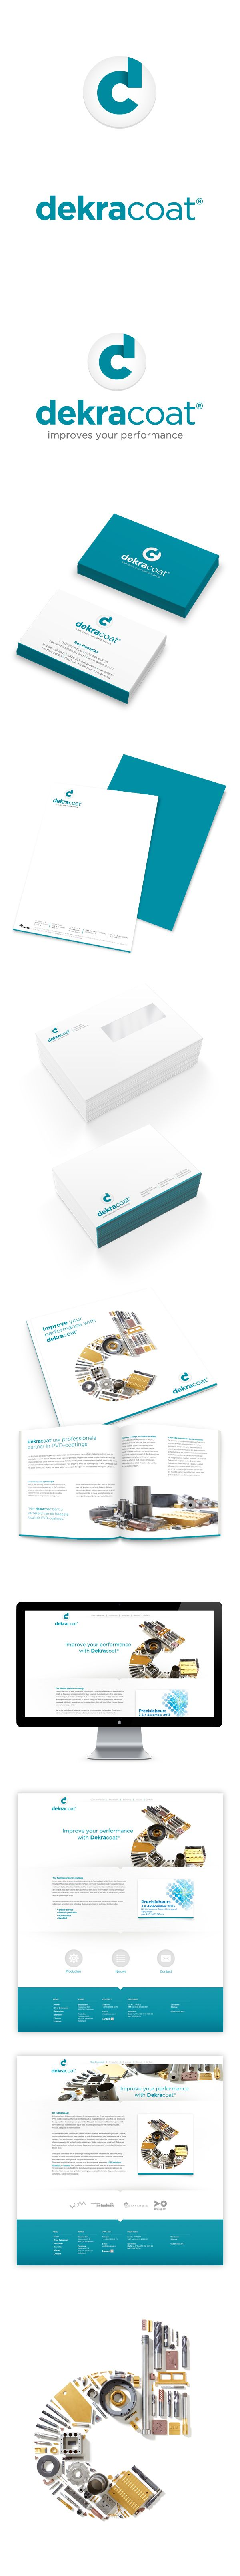 dekracoat Logo design, corporate identity, website by GiDesign Corporate design letterhead letter business card logo envelop colors graphic minimal website